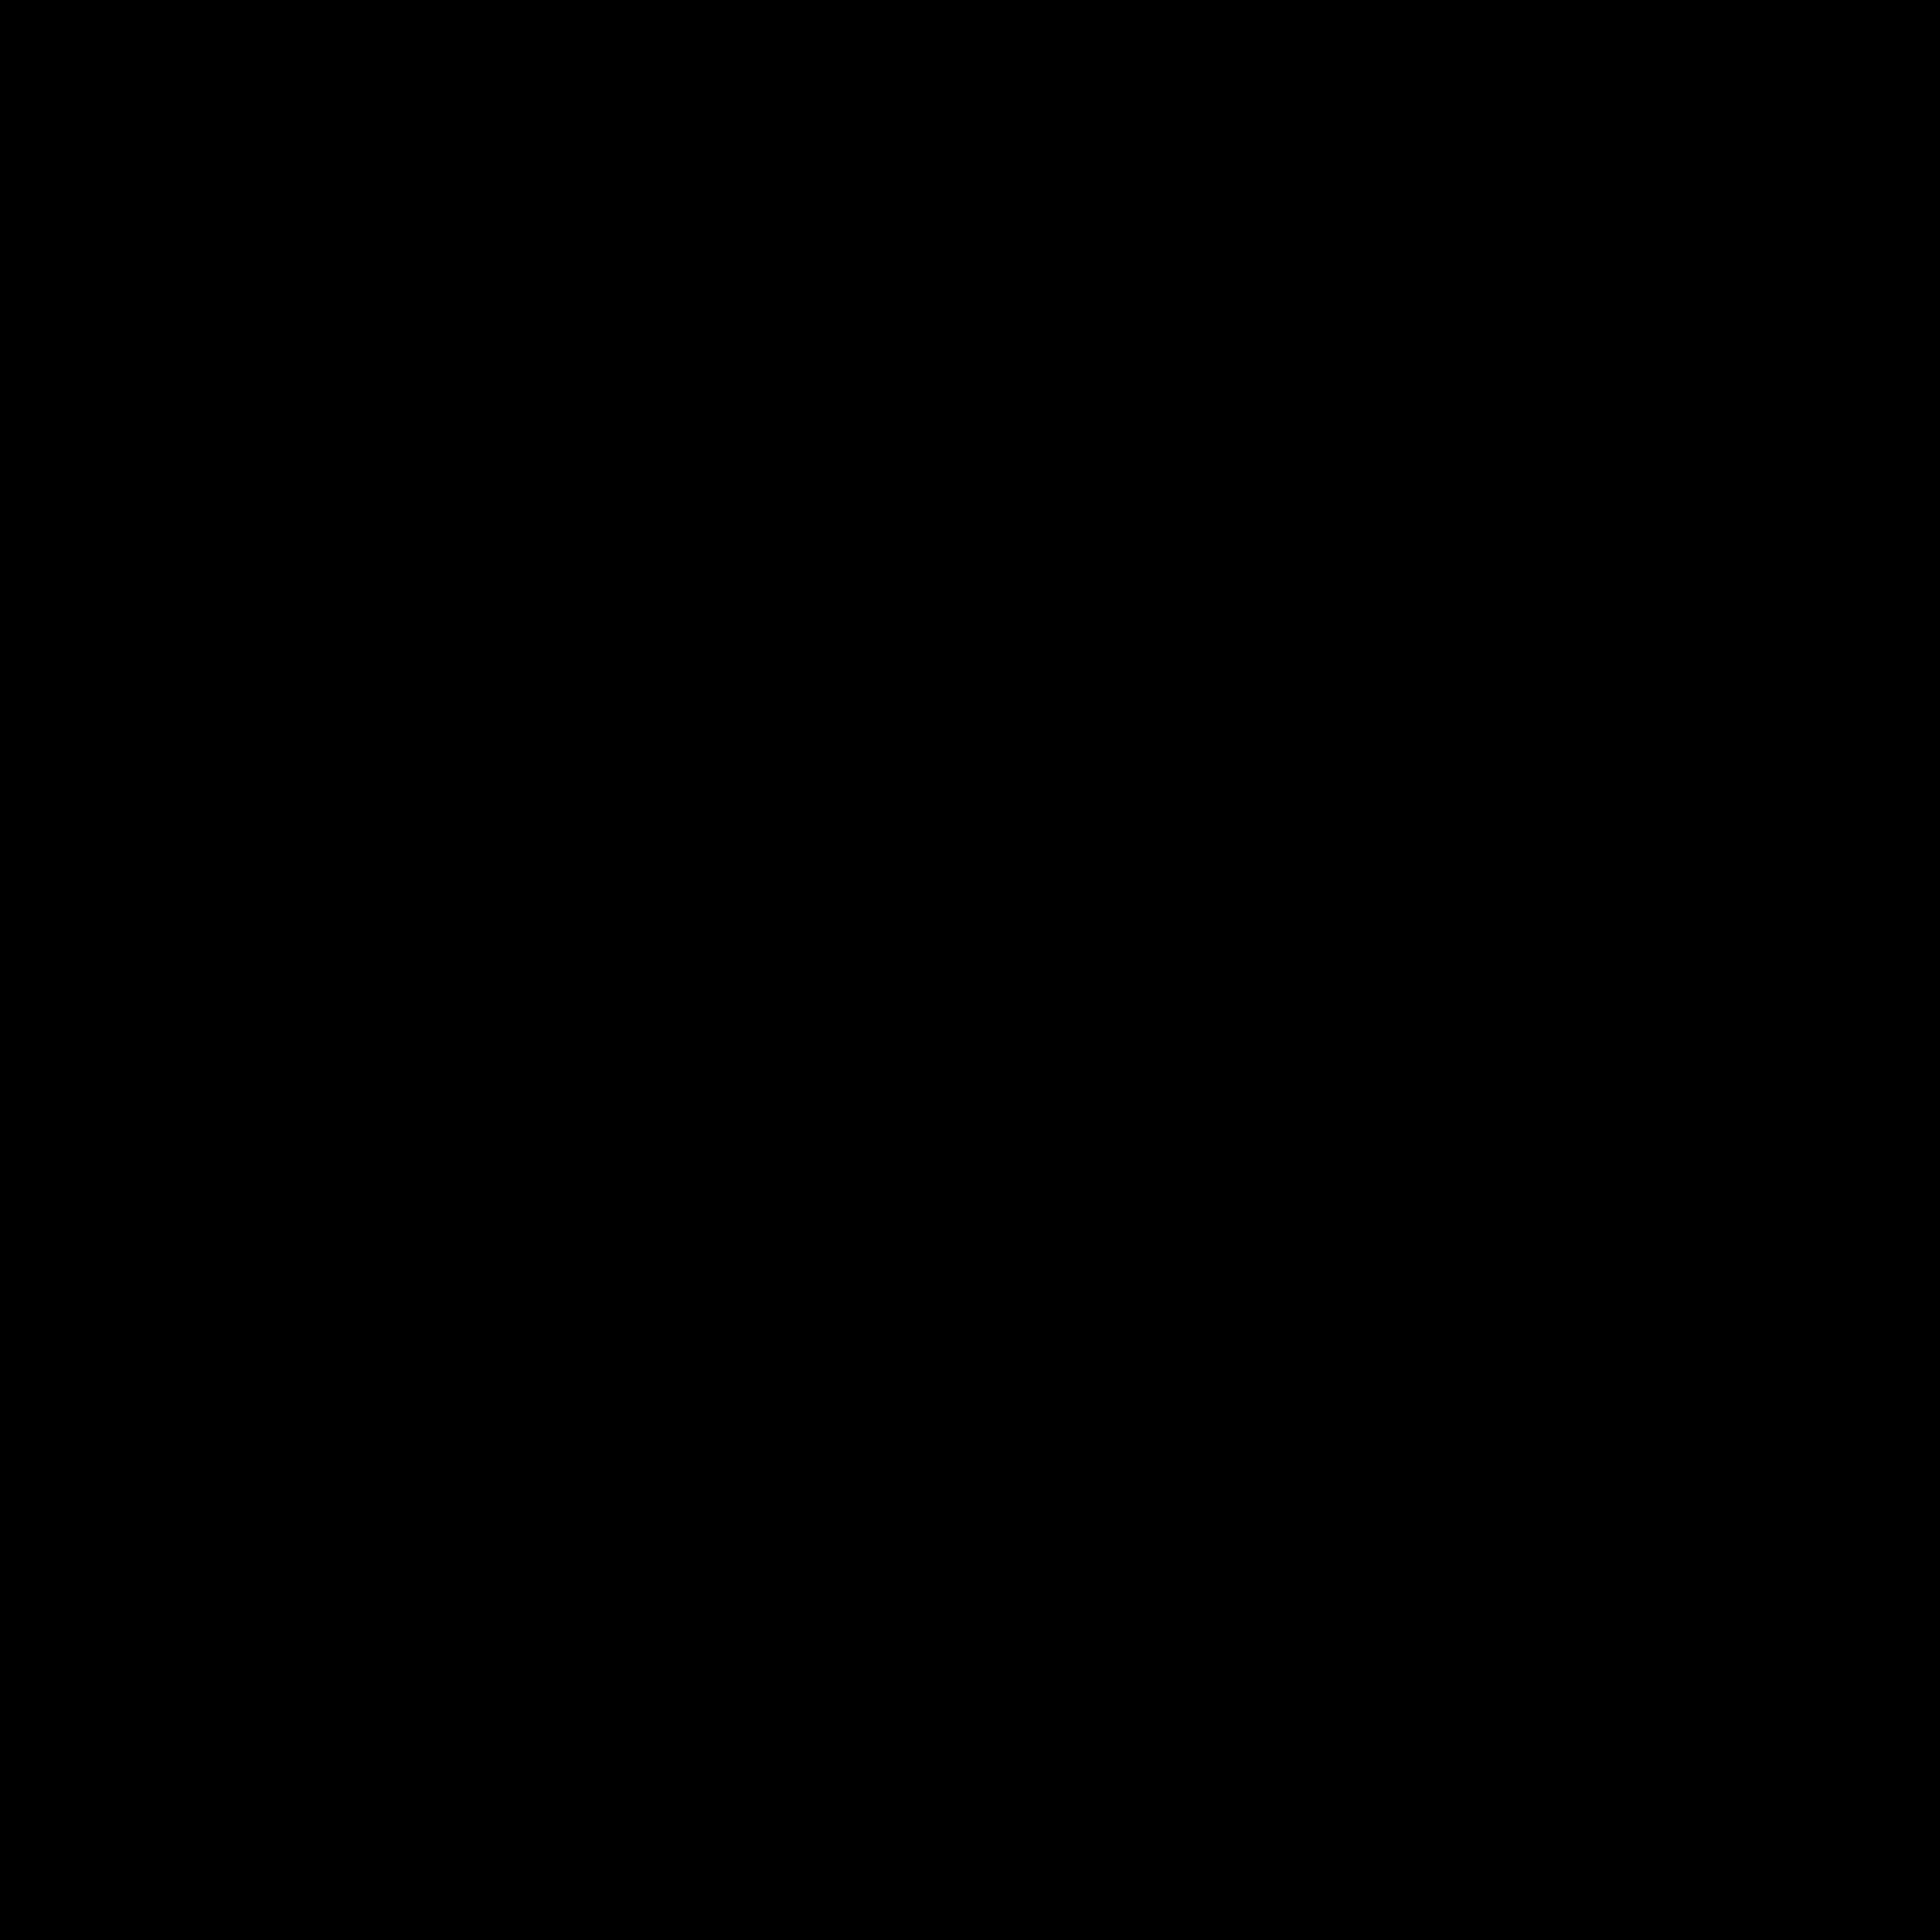 logo AIRBEONE